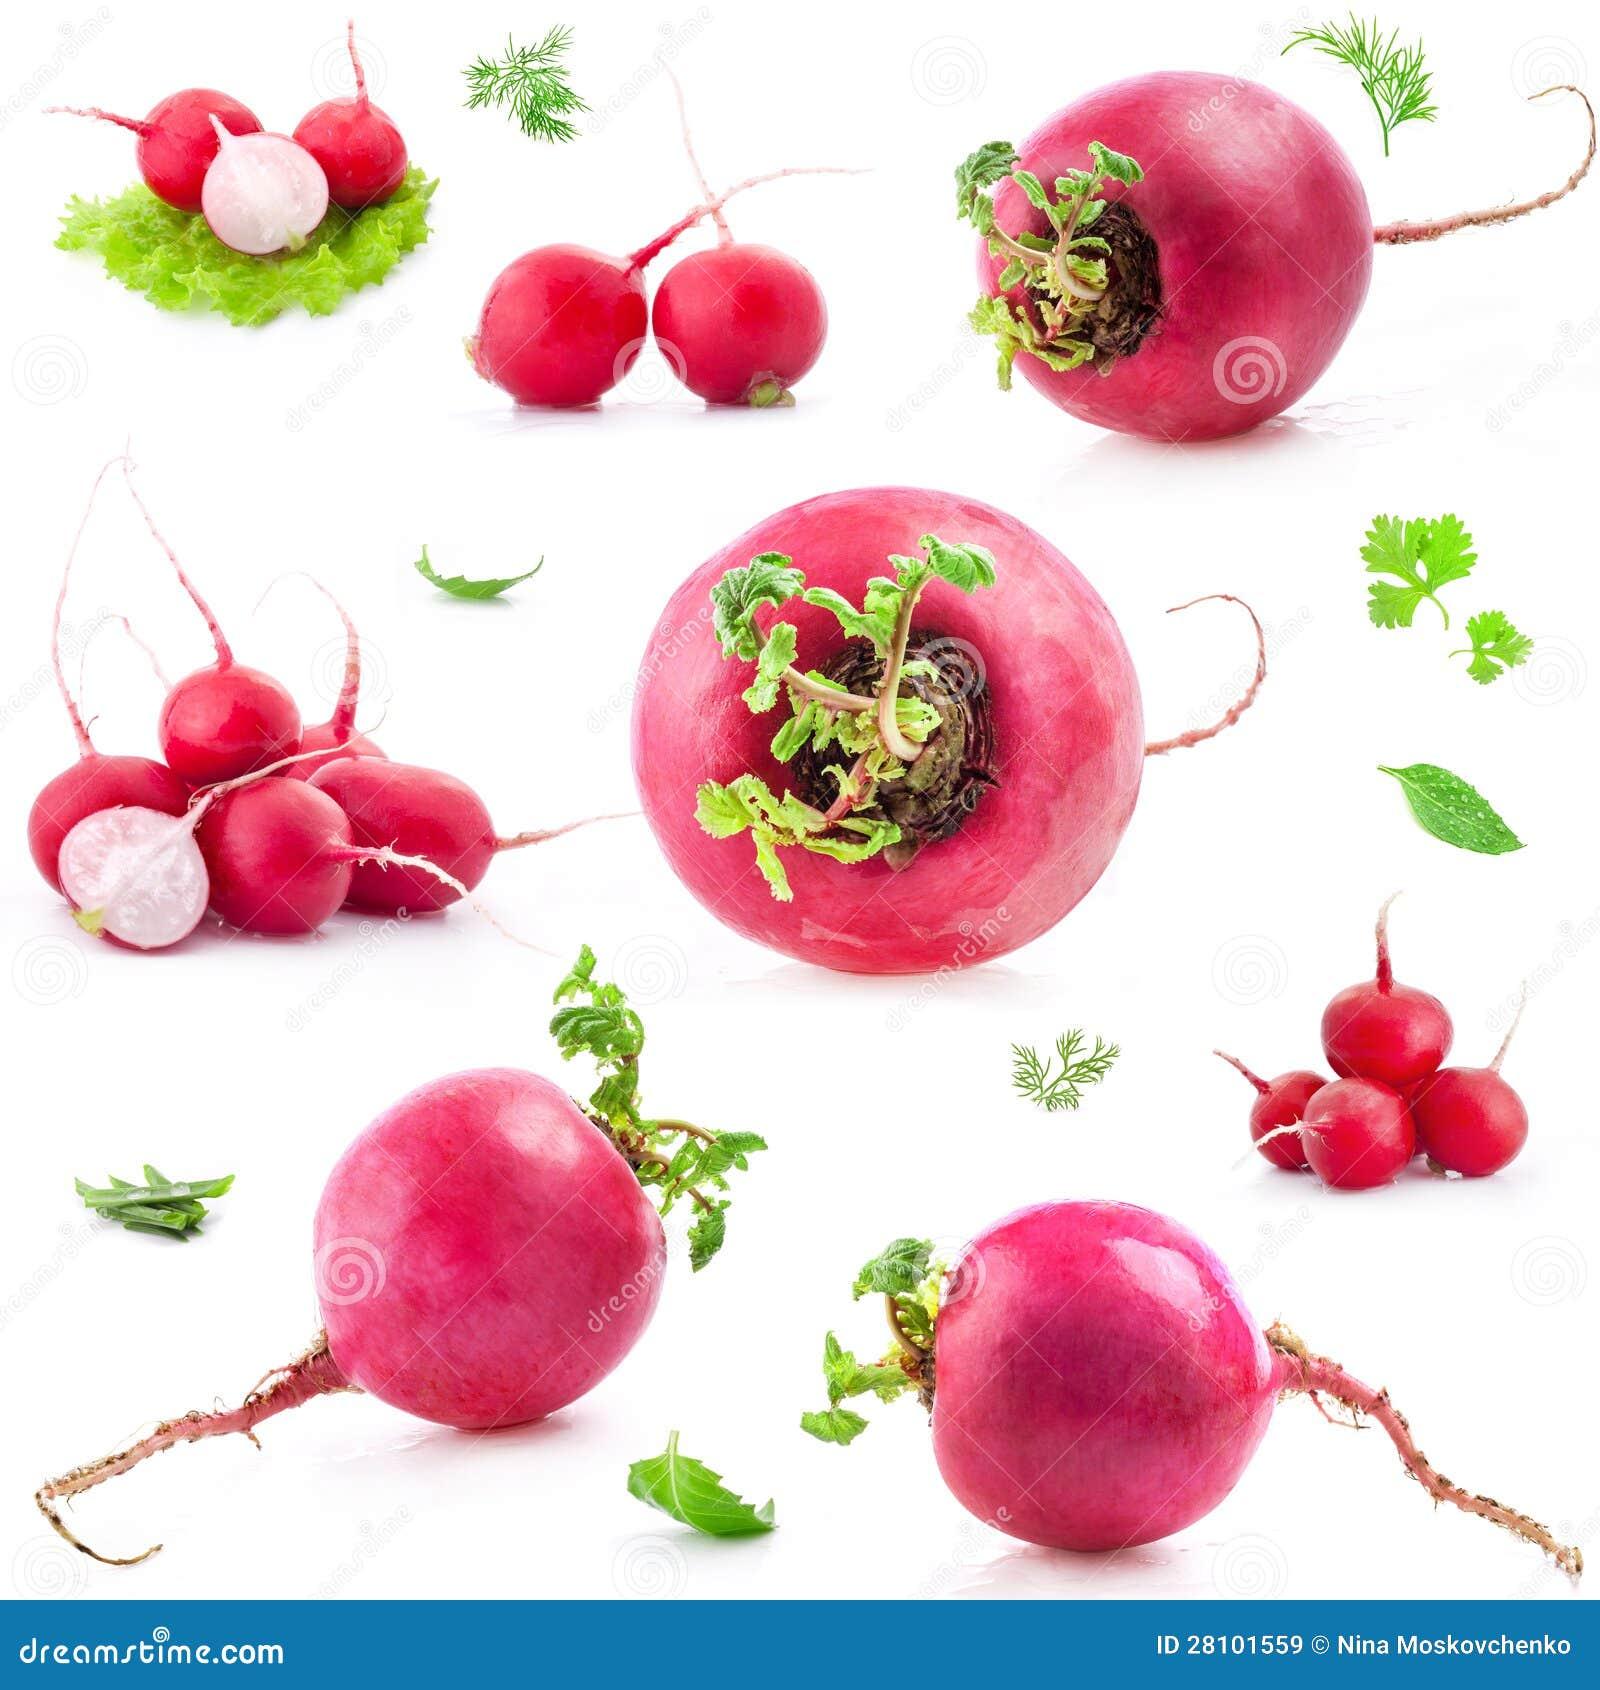 Big and small Red radish